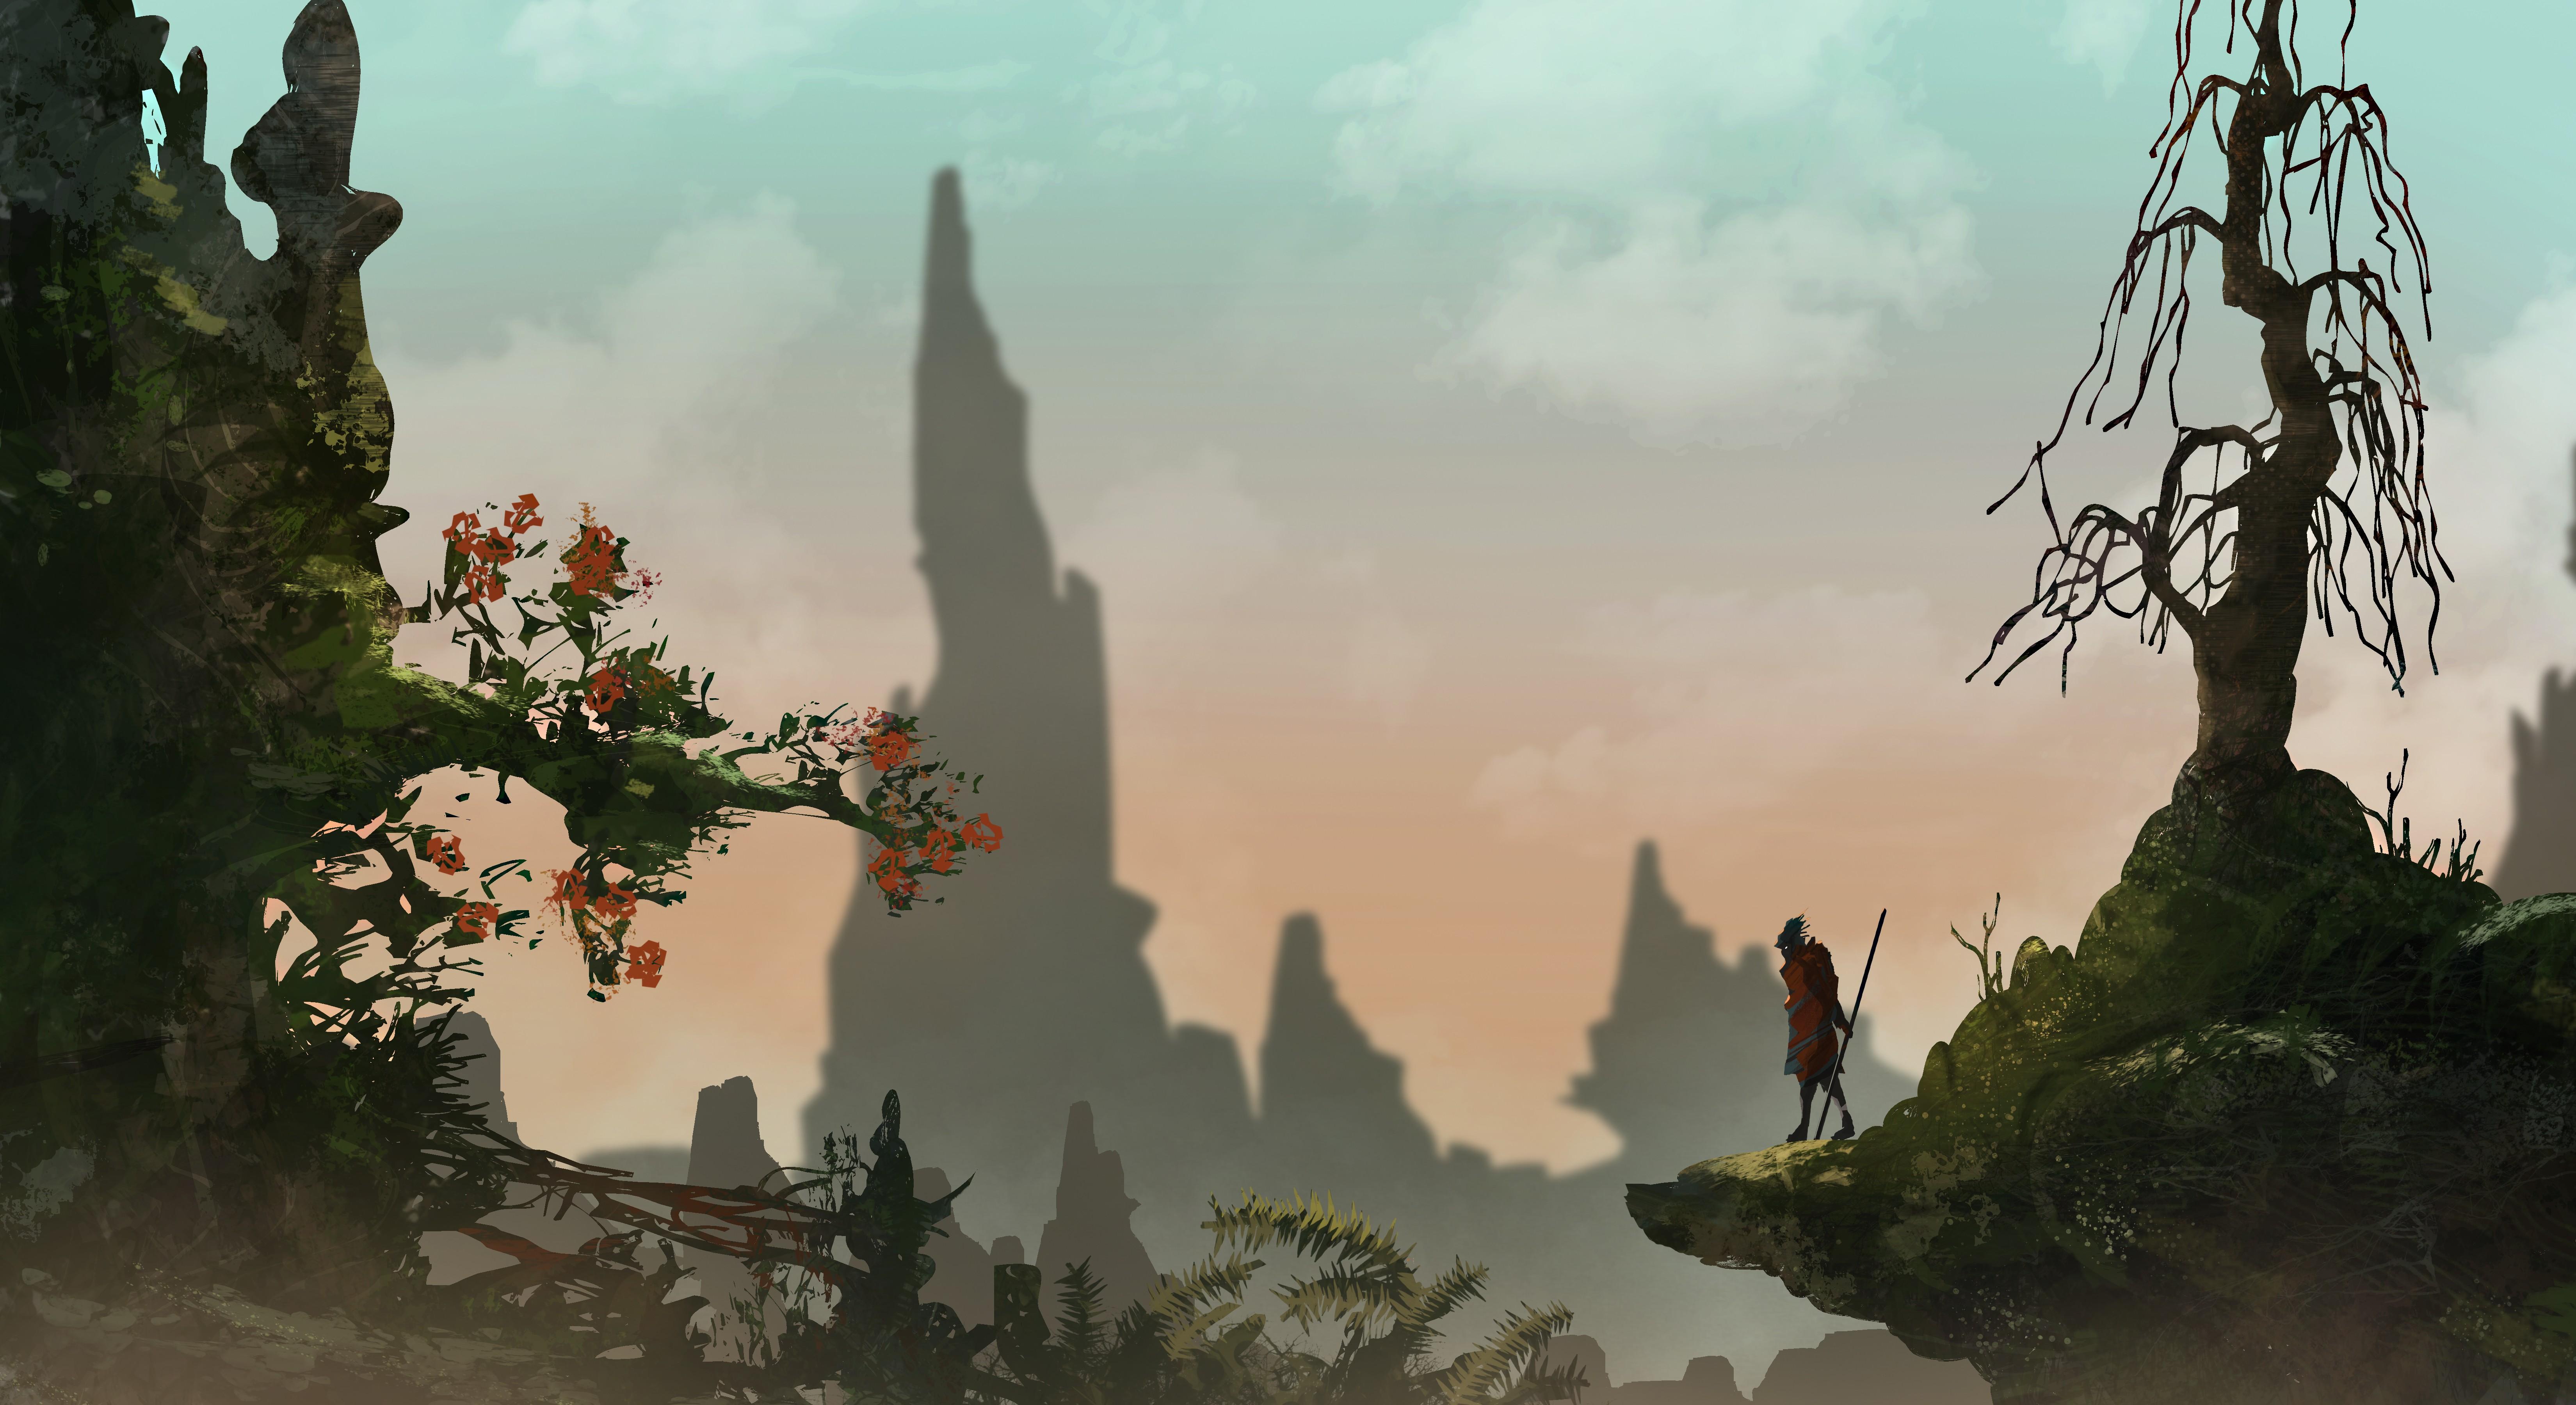 General 6600x3600 fantasy art nature mist warrior spear loneliness hero trees DeviantArt artwork digital art